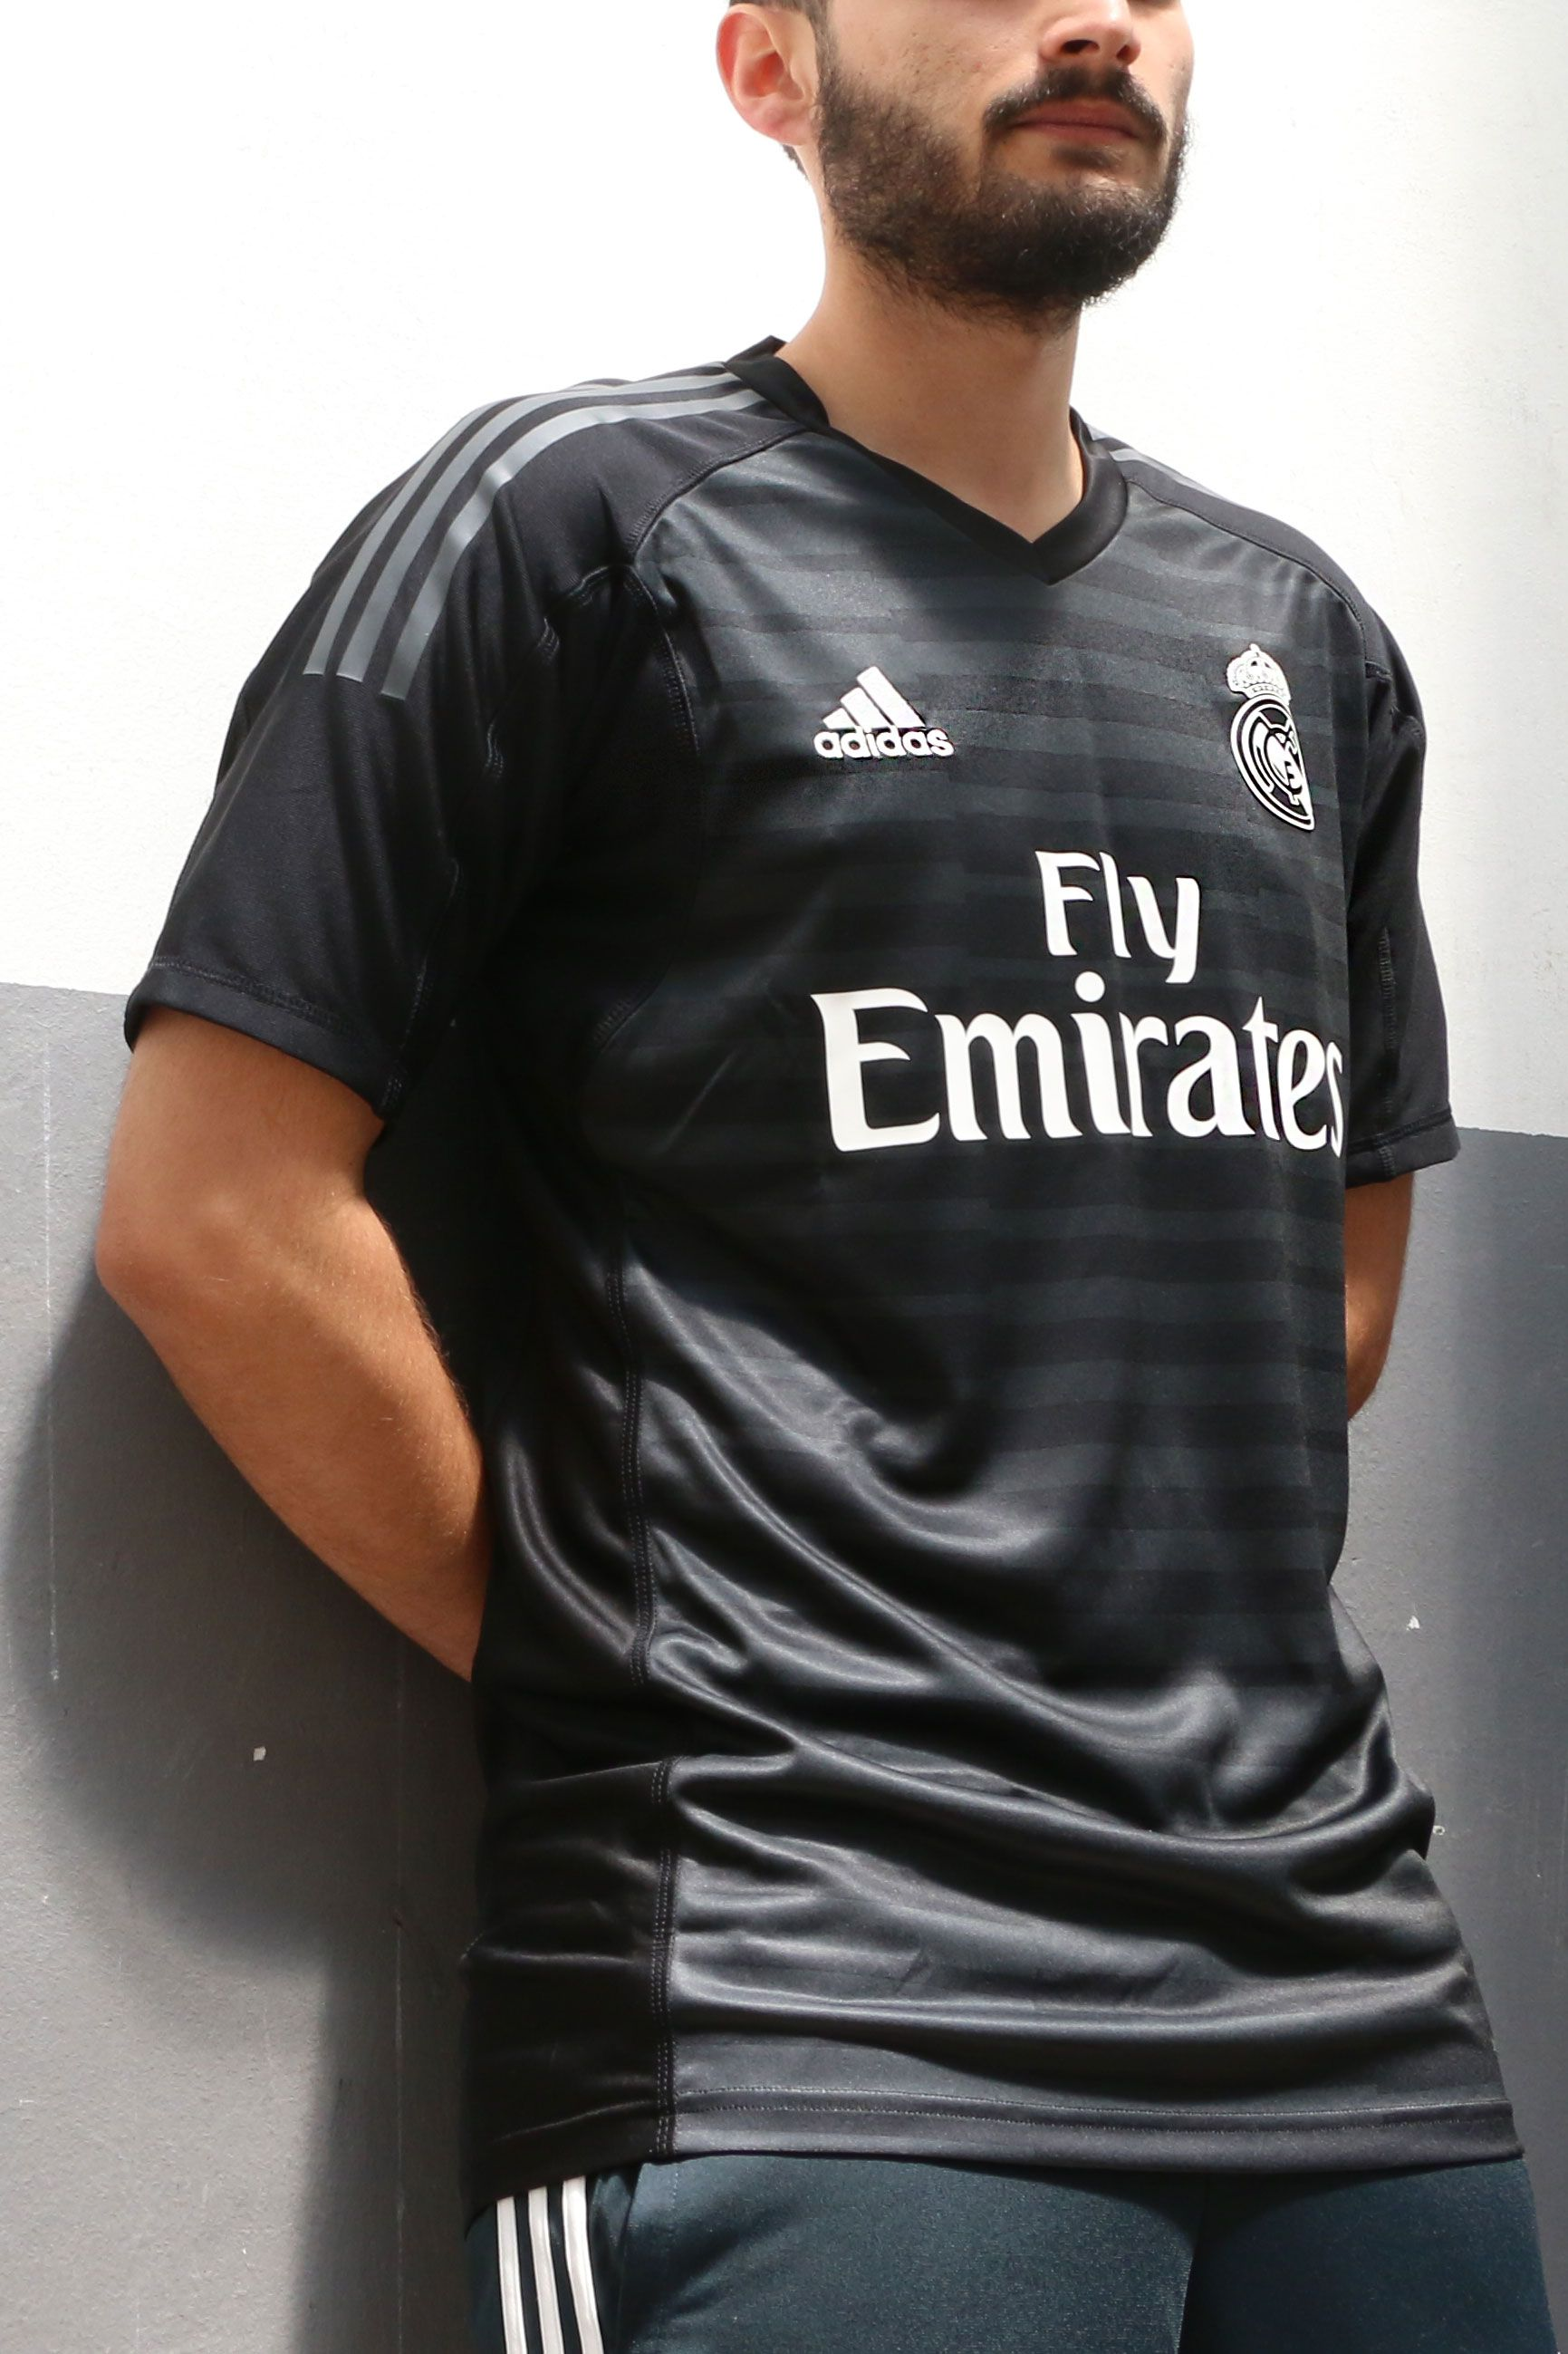 c3afce76aa7e8 Camiseta de portero Real Madrid 2018 - 2019 - negra